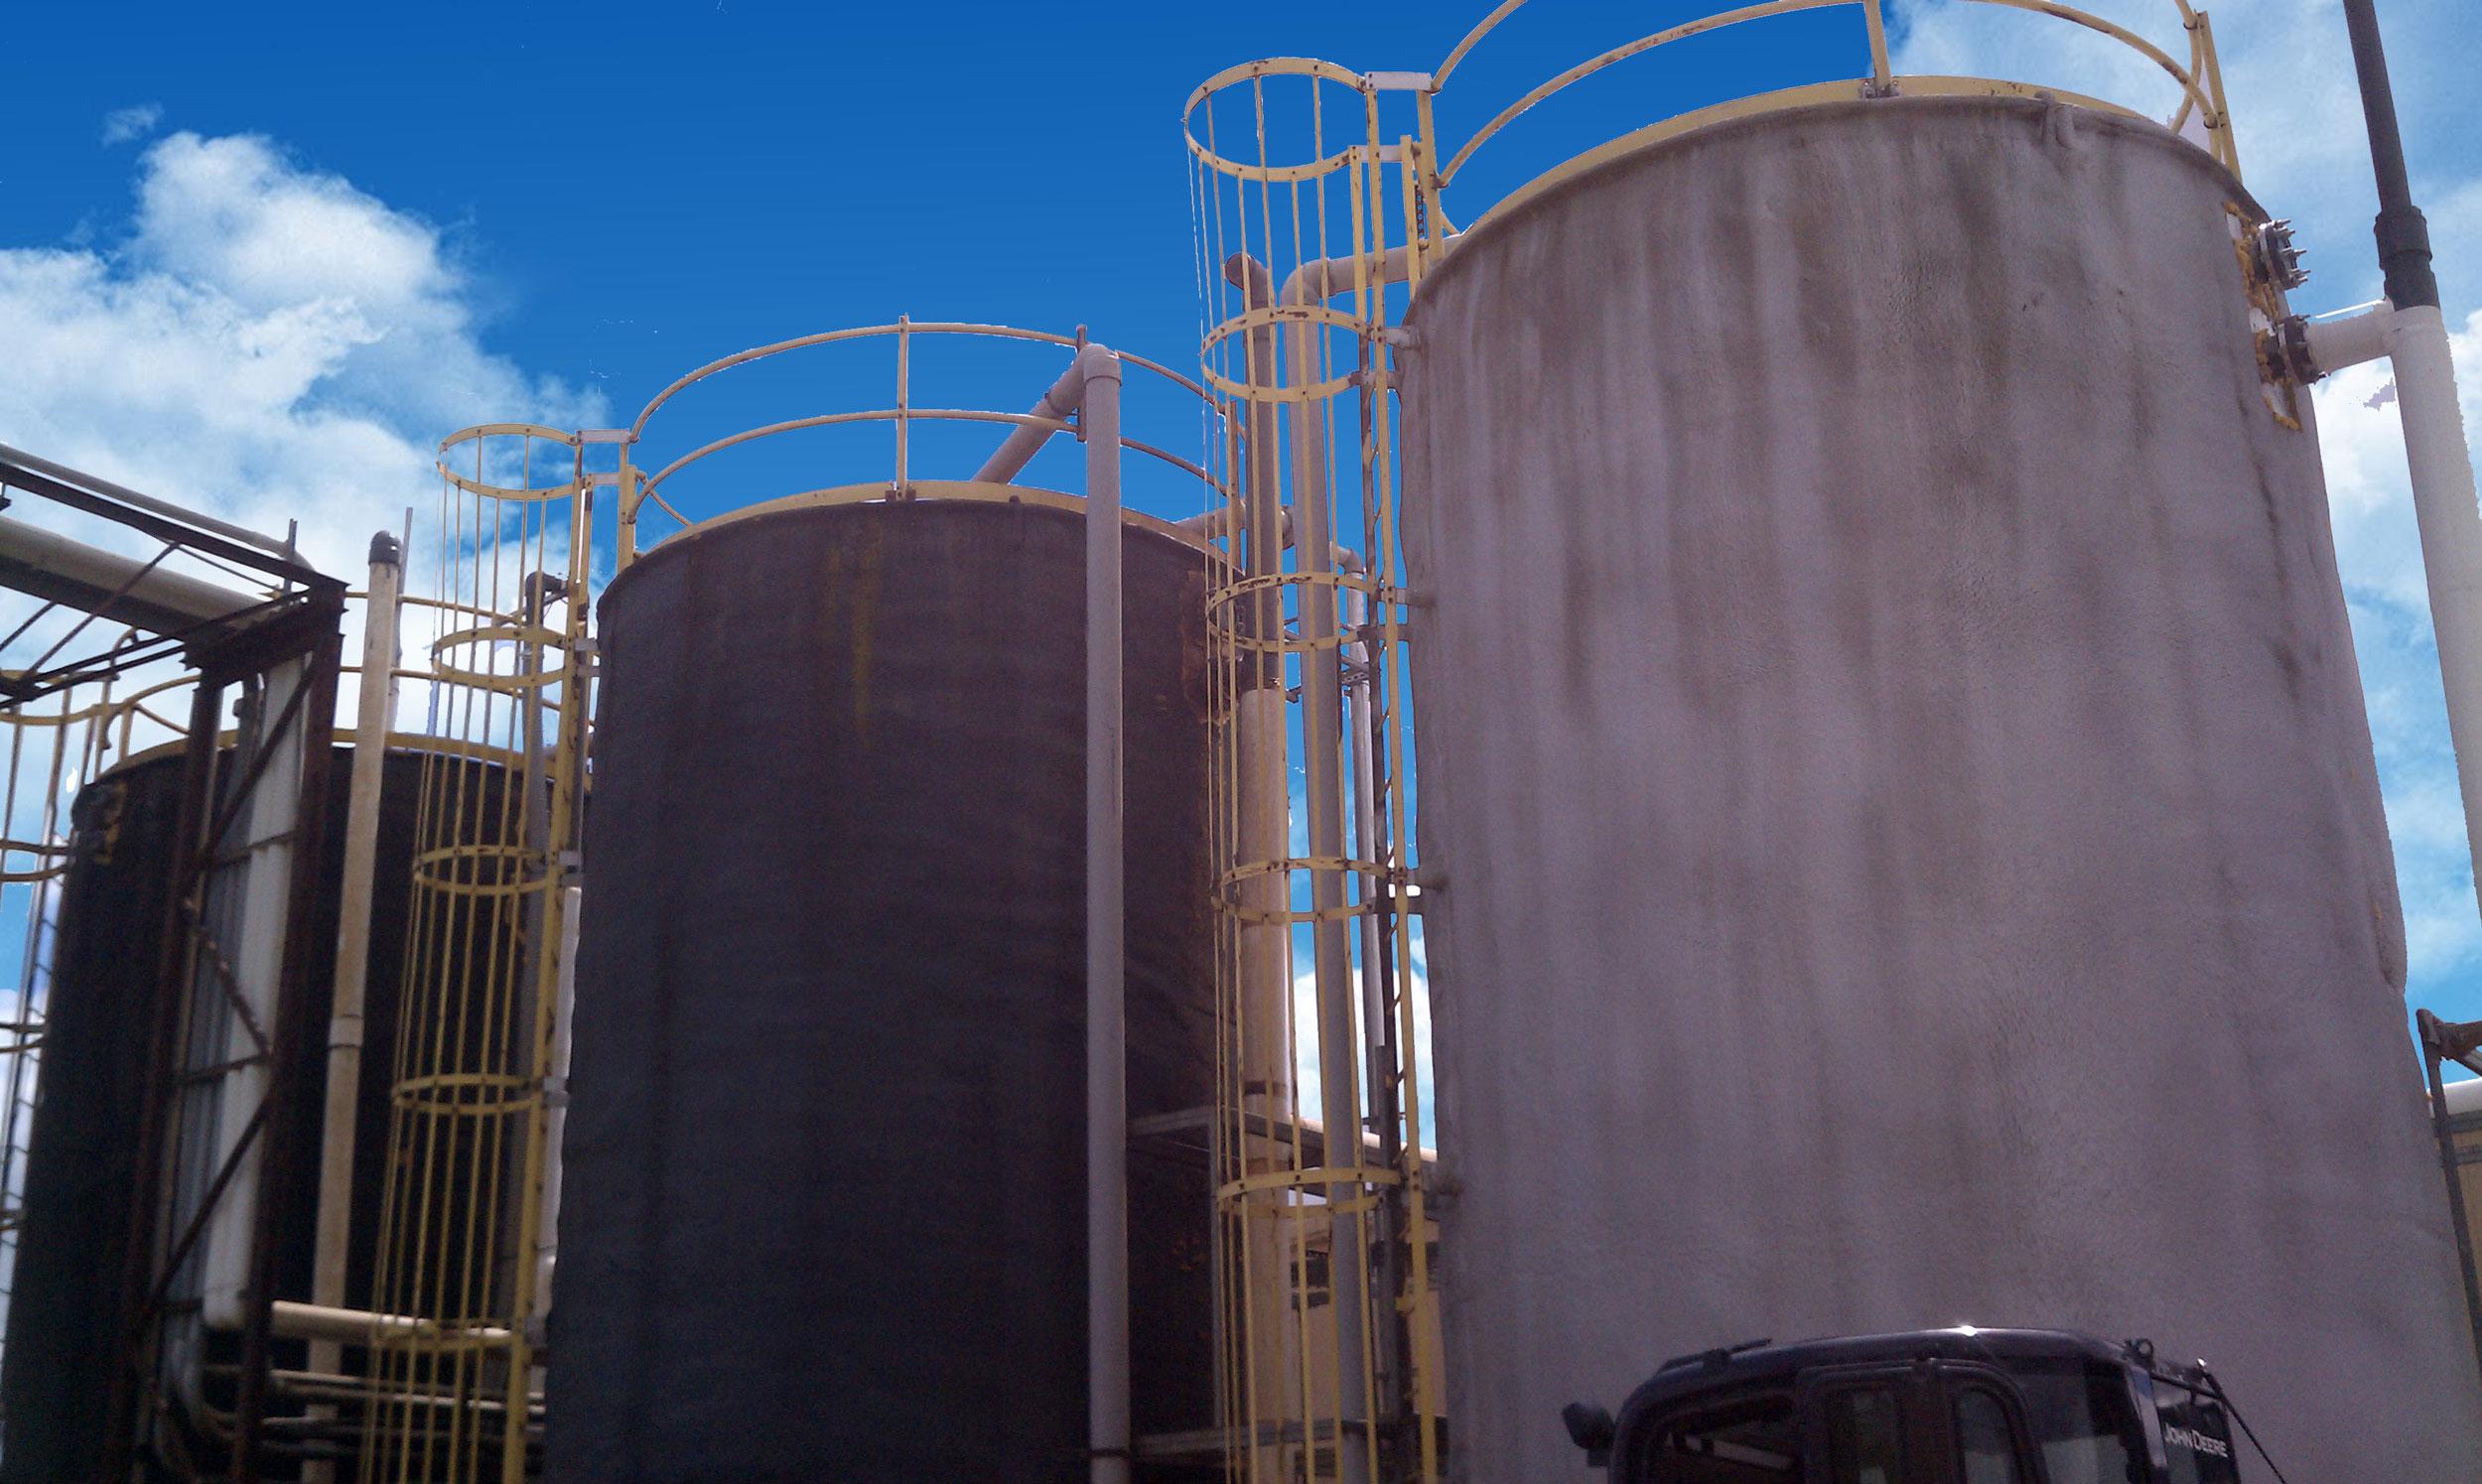 BioPortz reactor tanks